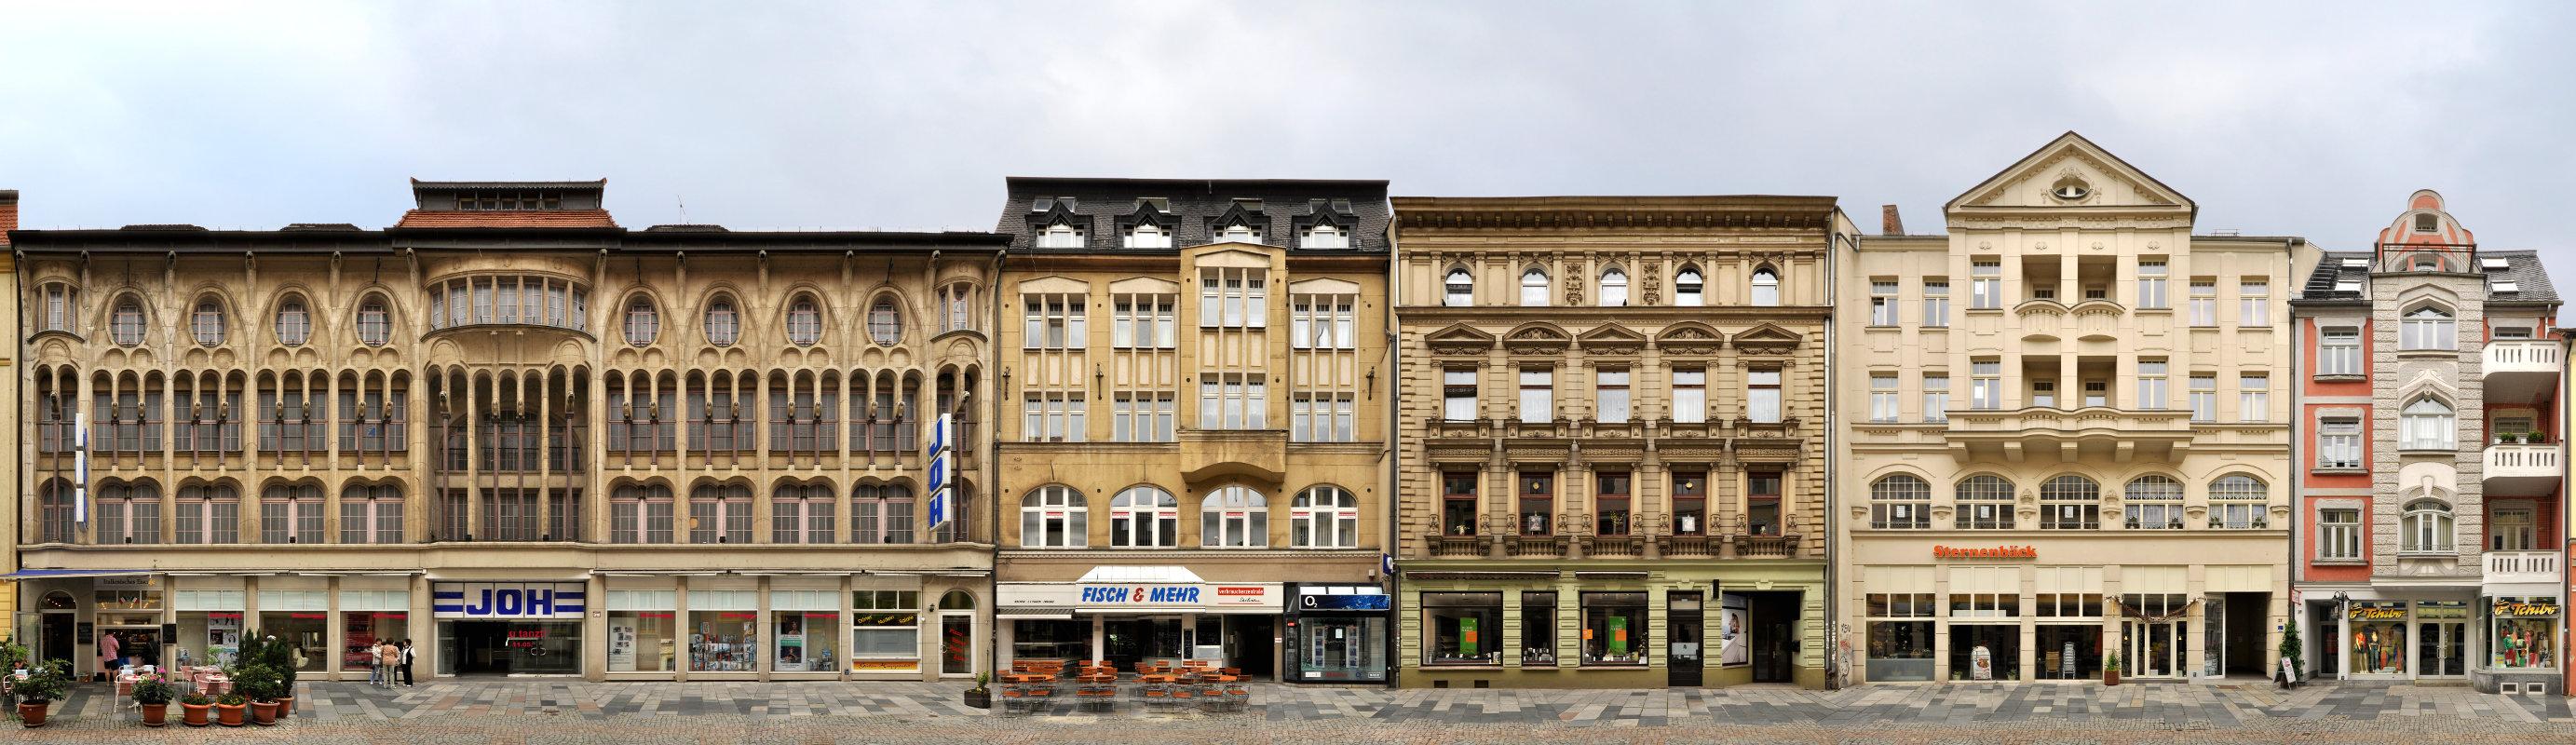 Kaufhaus Joh Zwickau